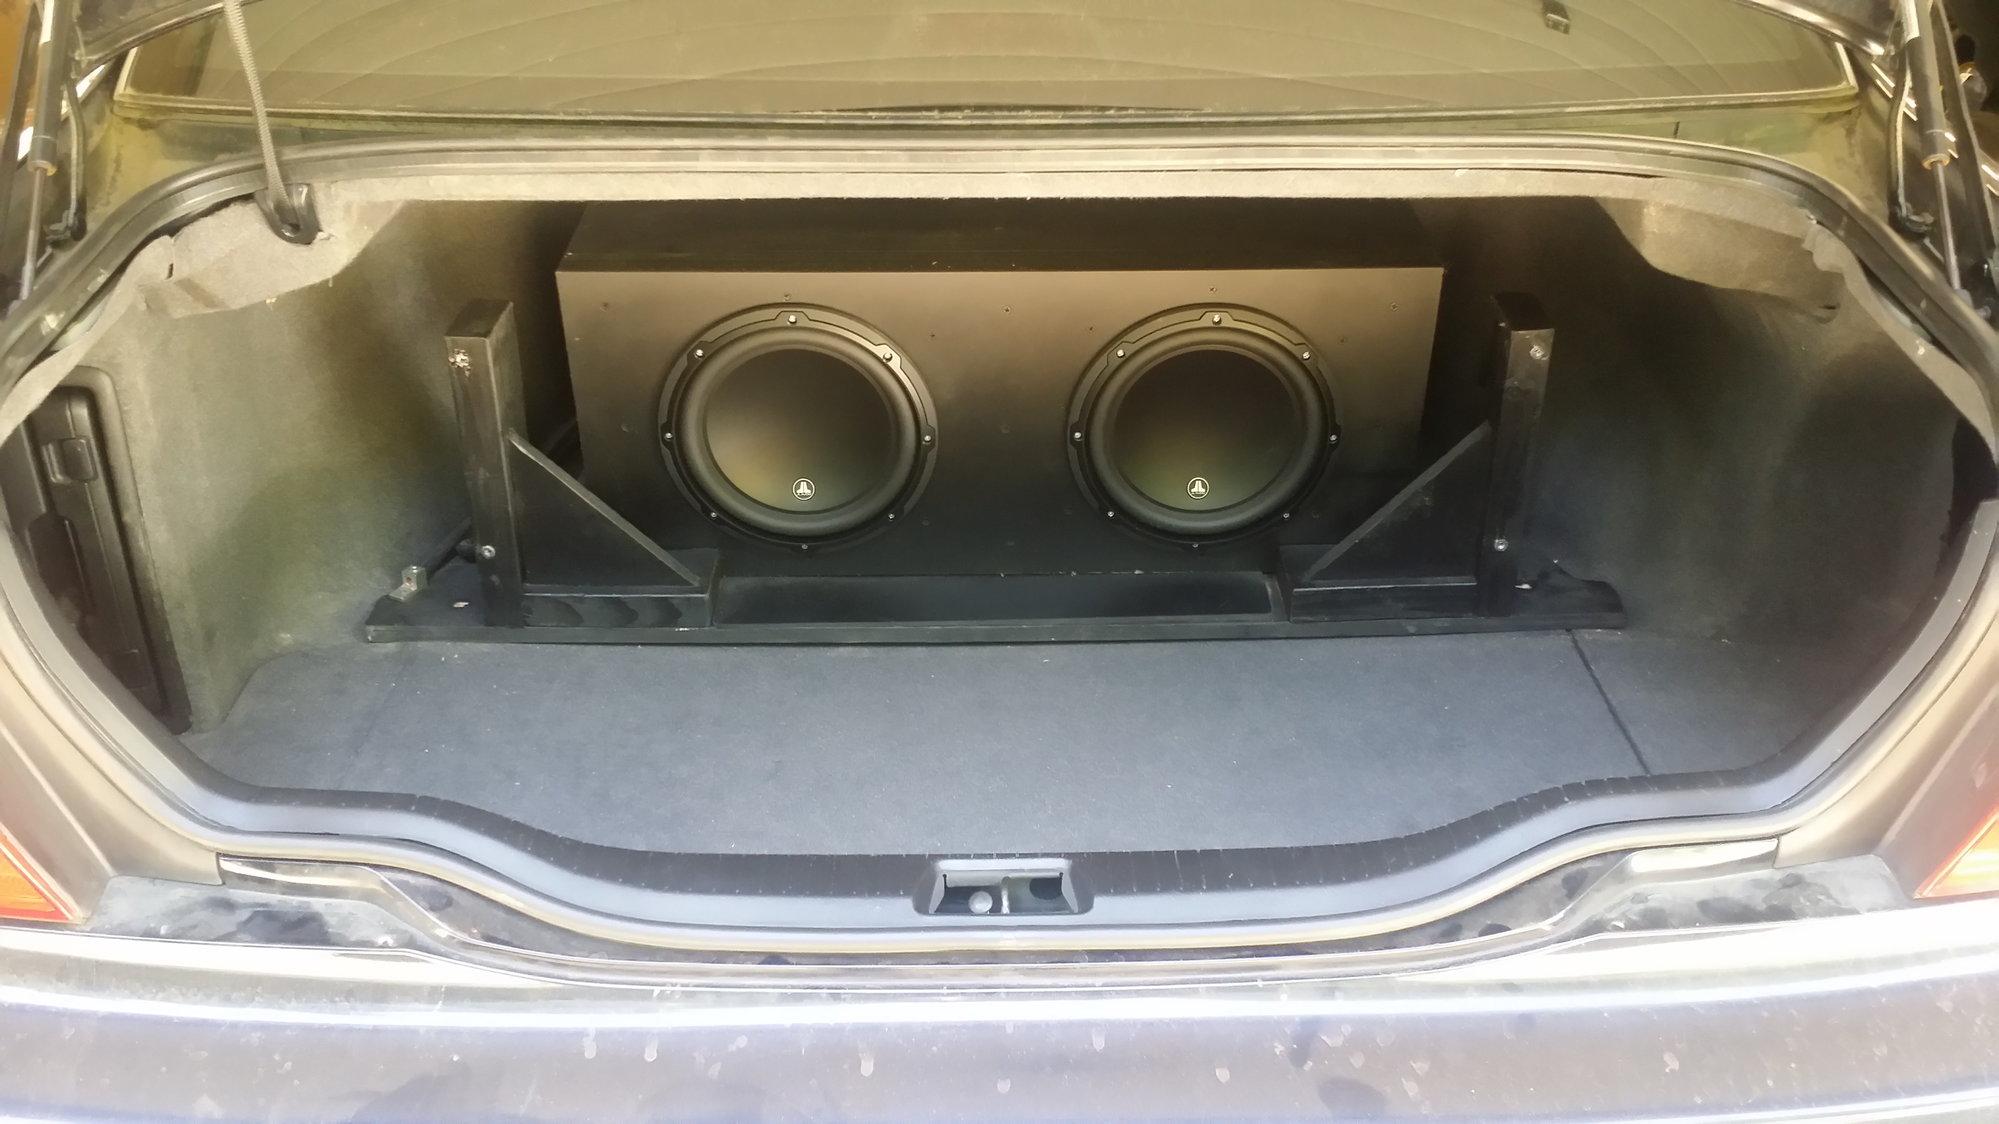 ls430 subwoofer 2001 install box sub custom amp audio rack jl lexus clublexus 2006 ls sealed hidden behind 3rd gen